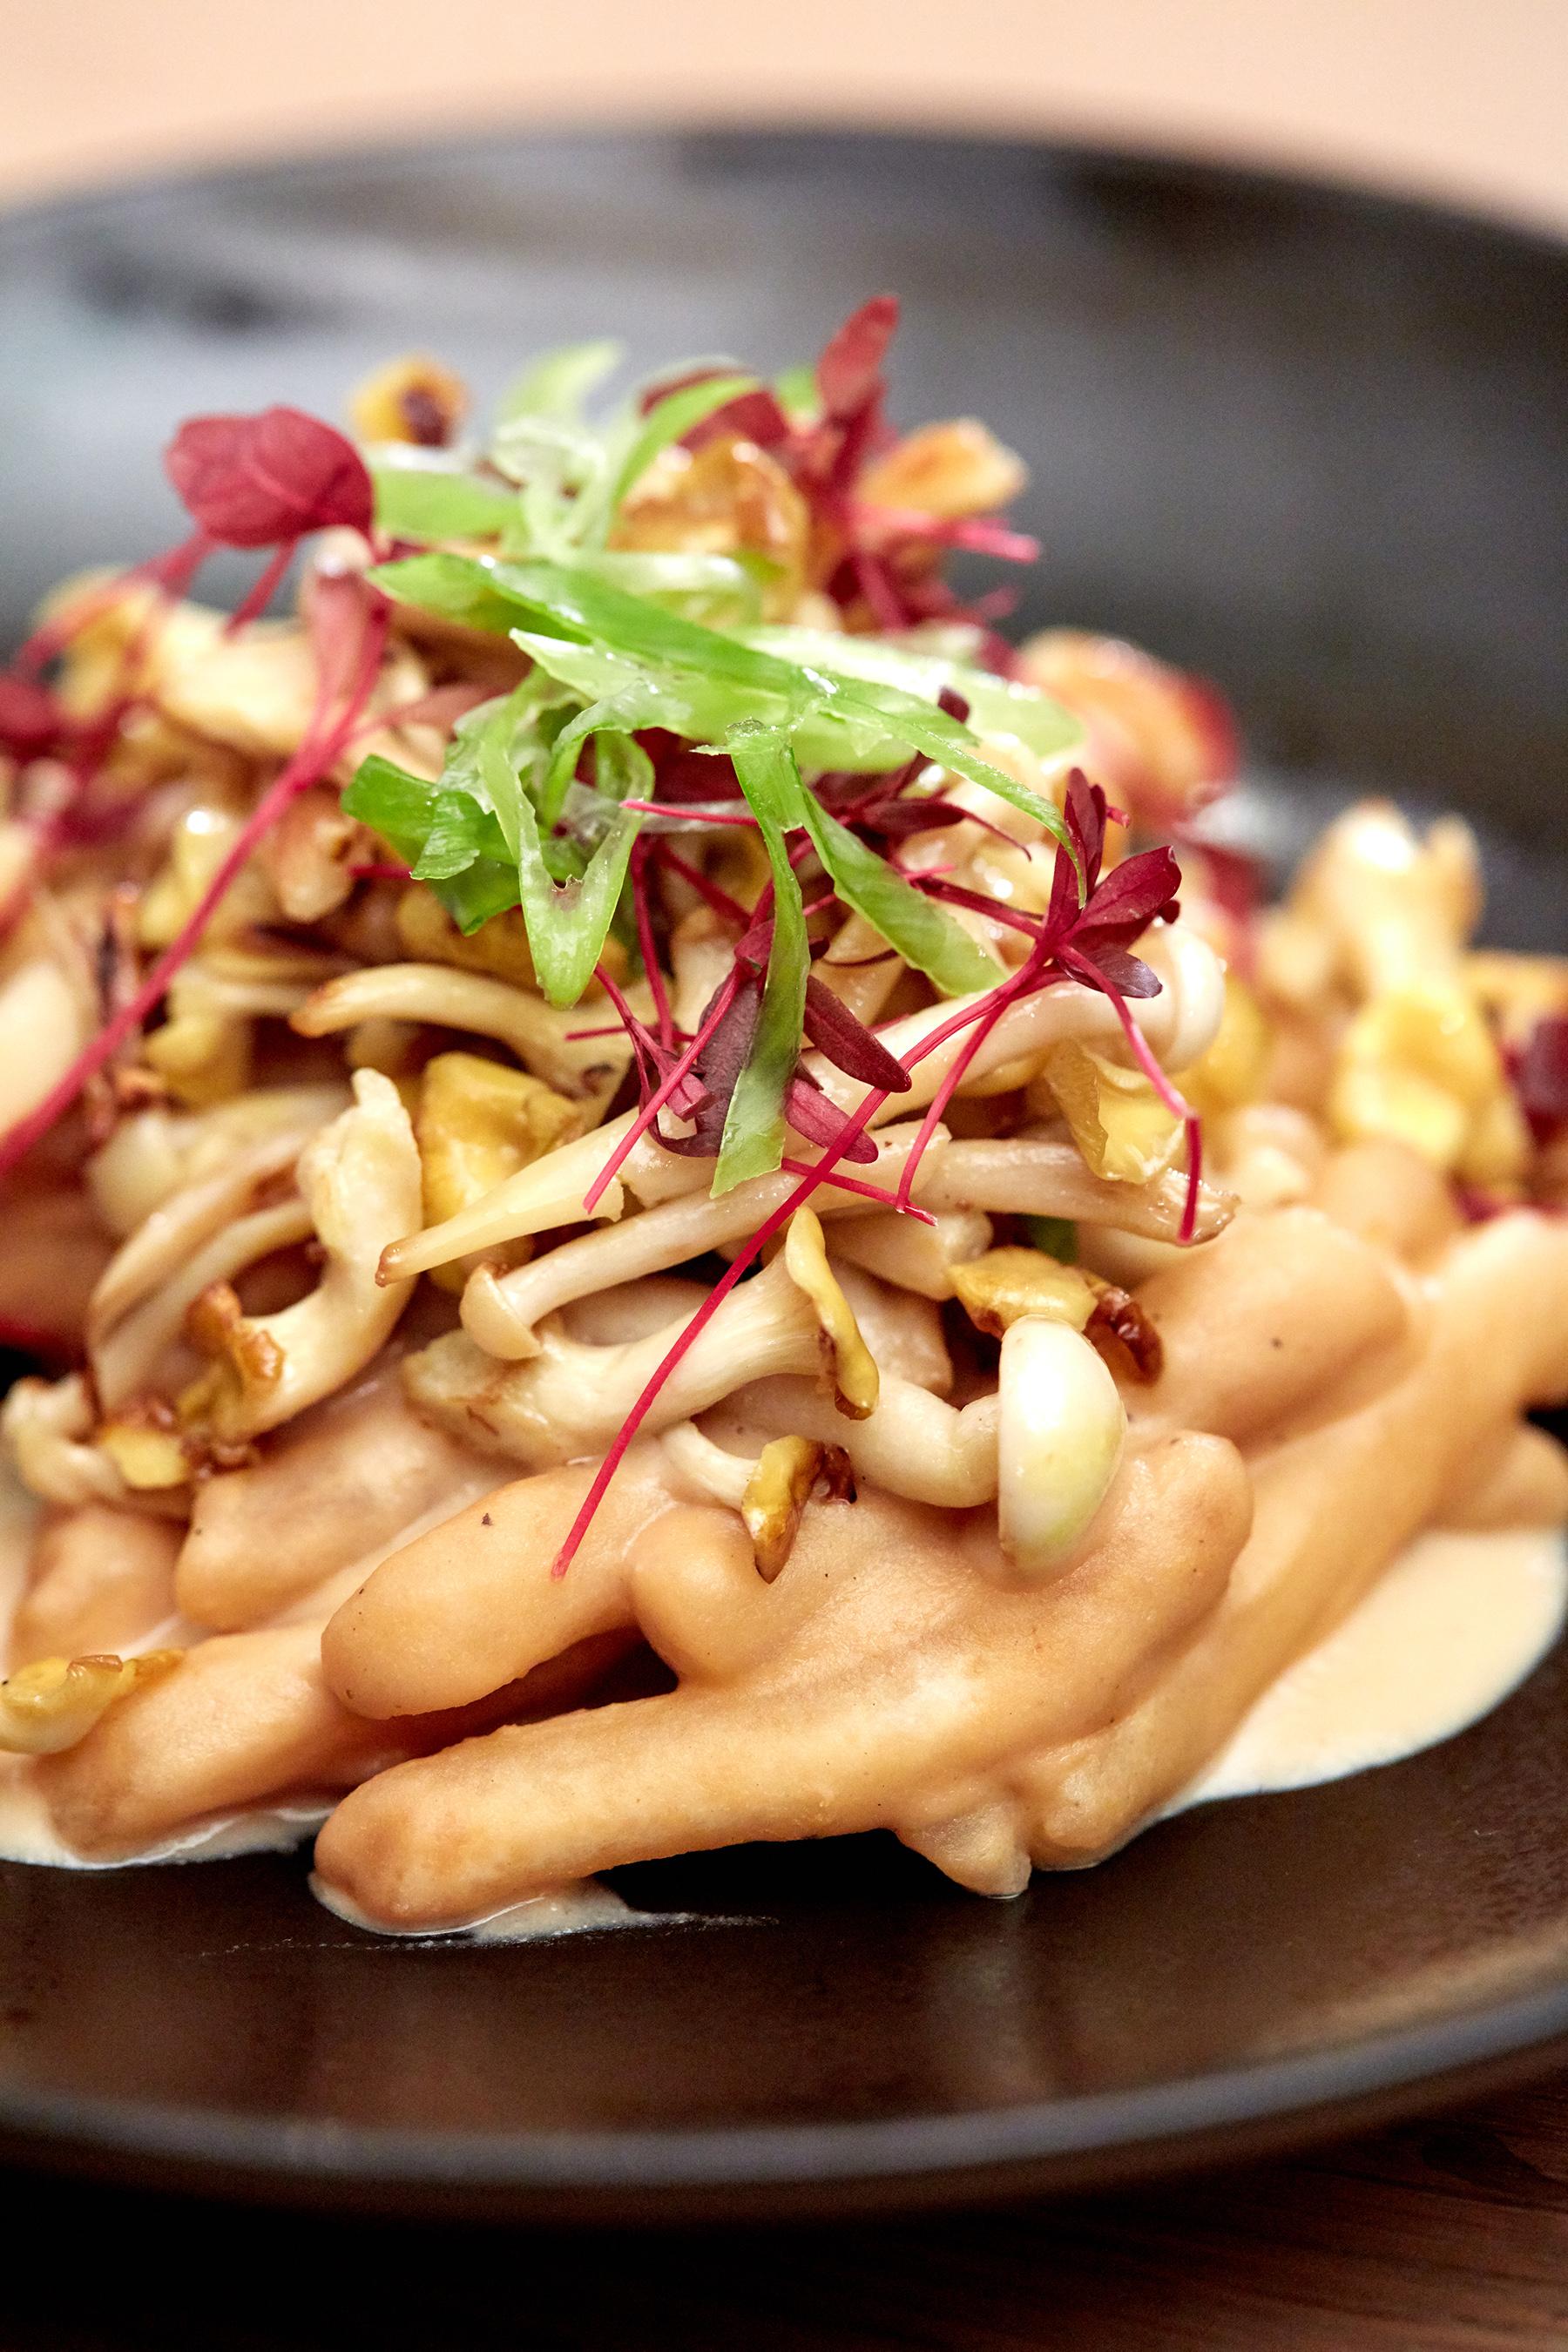 Chef Esther Choi's Rice Cake Gnocchi with Hummus Soy Cream Sauce and Crispy Wild Mushroom